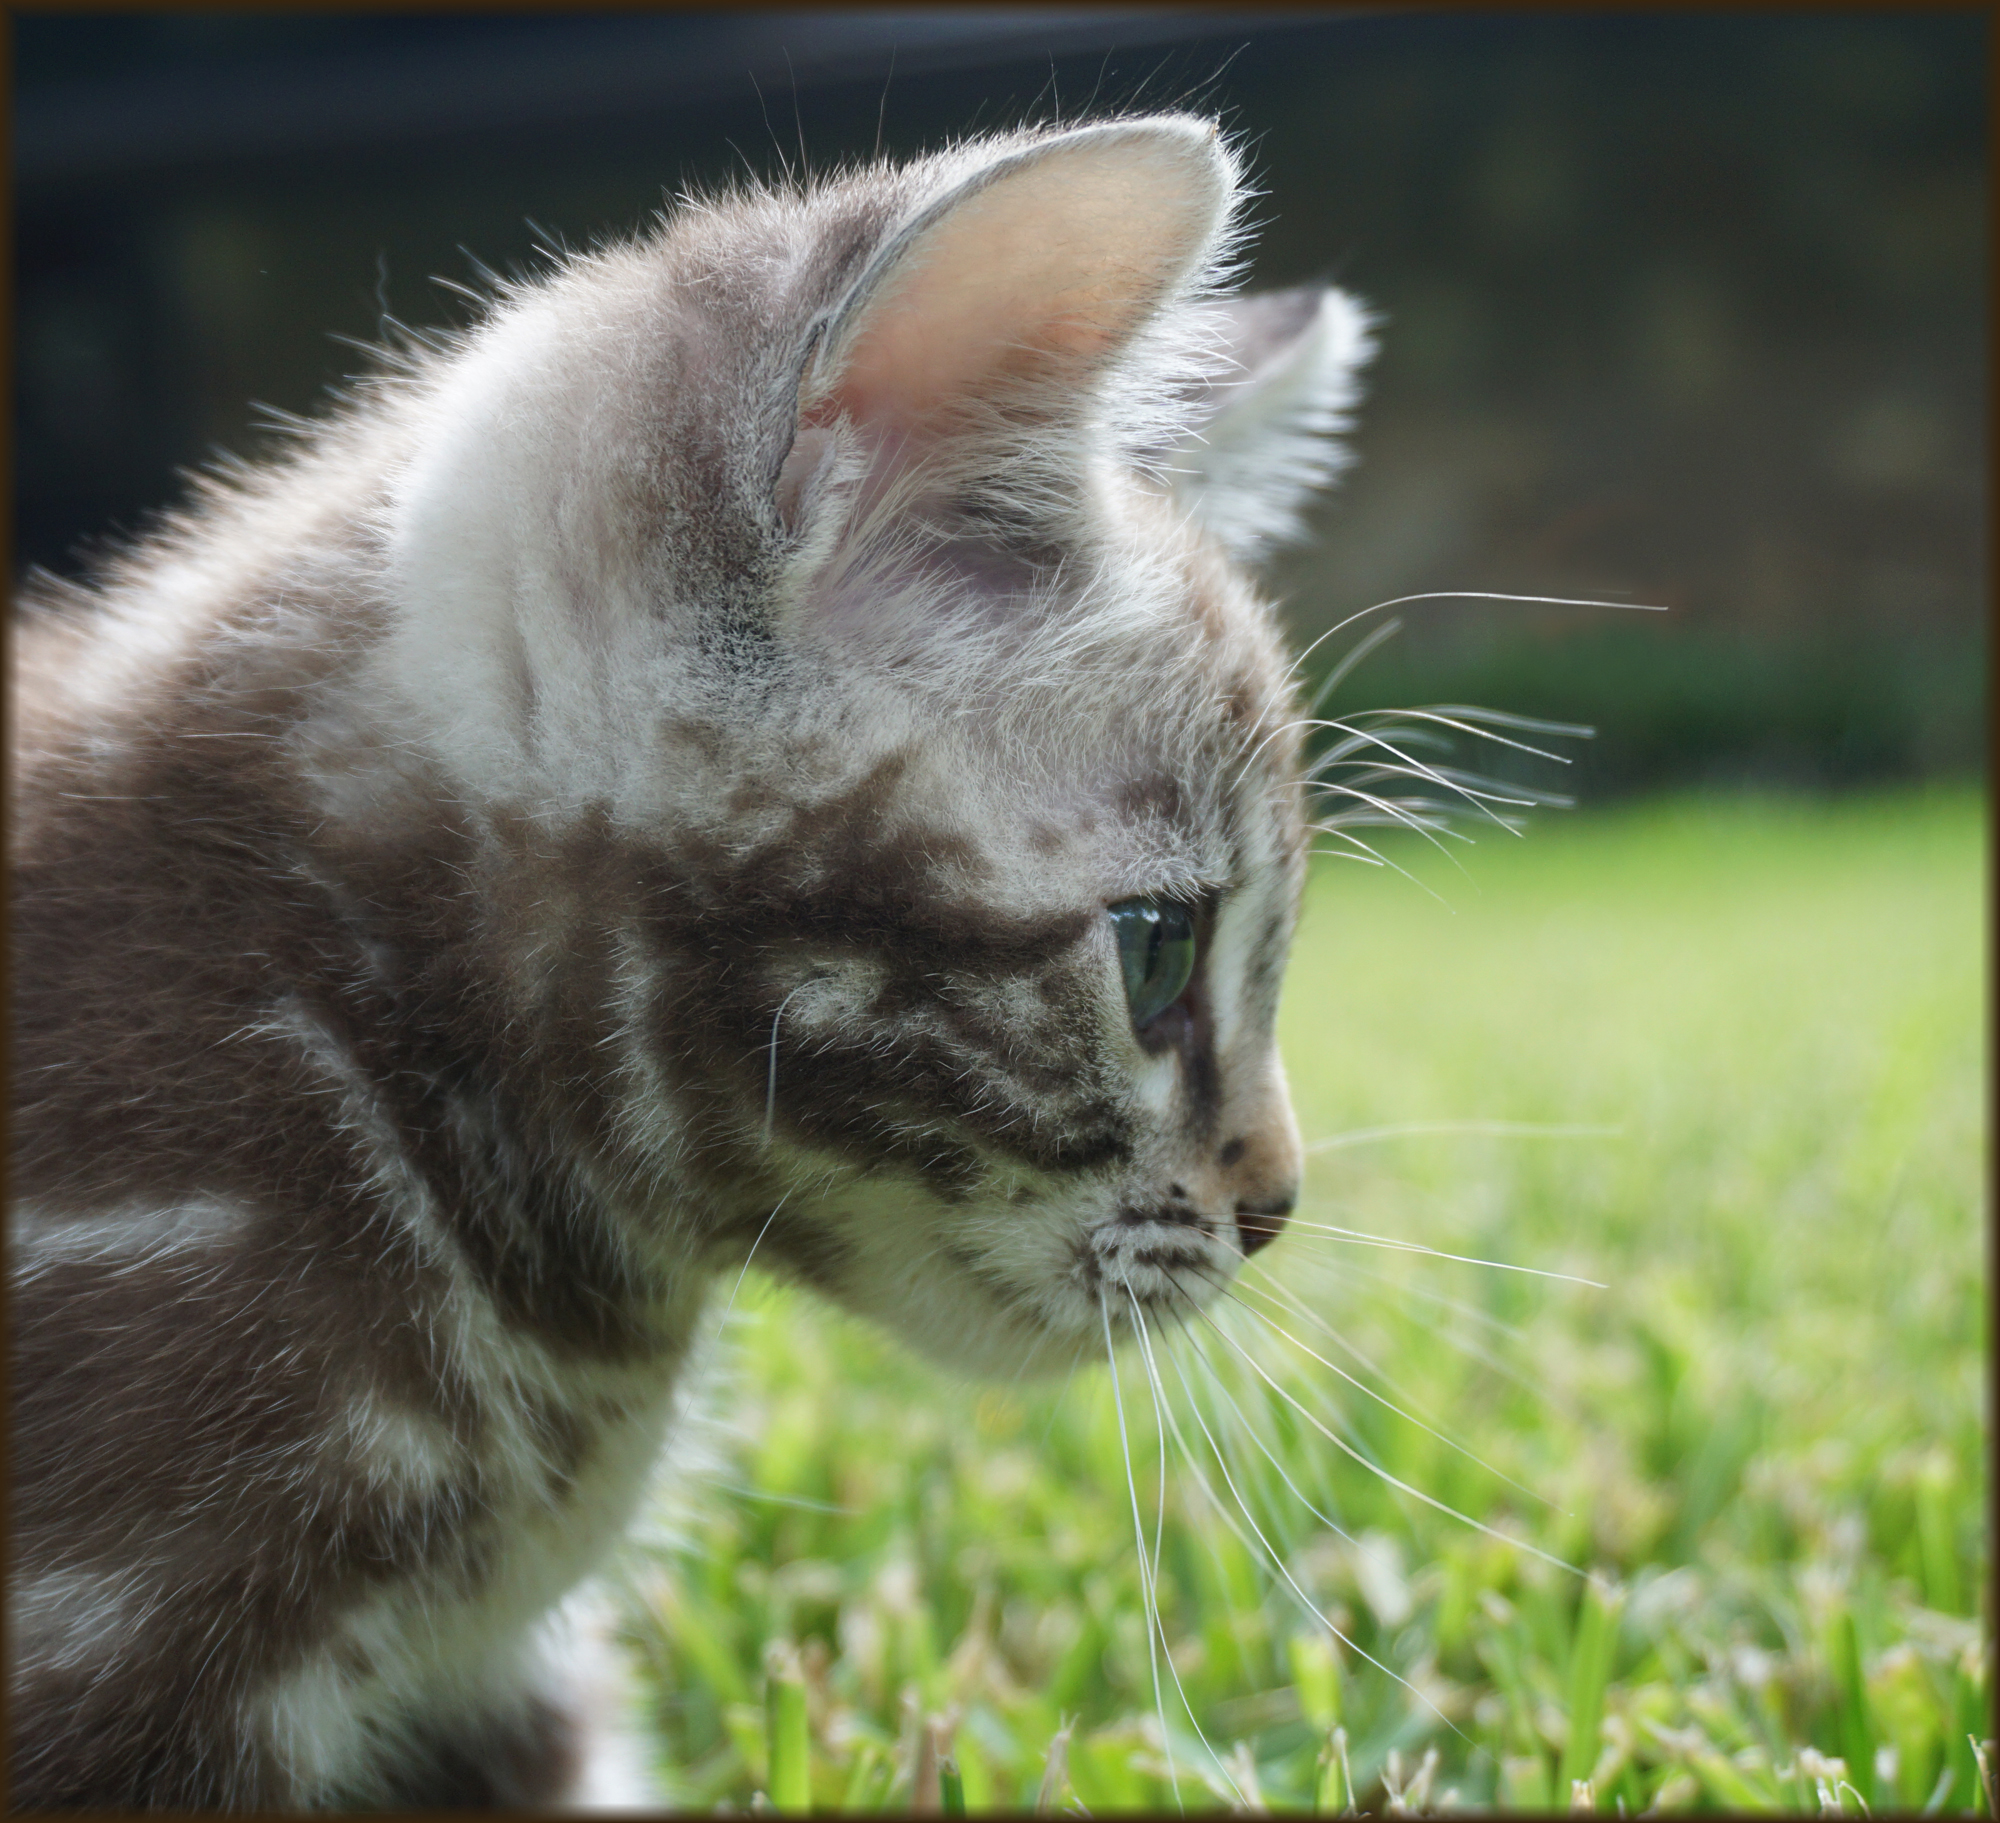 Cheetahsden Sandler